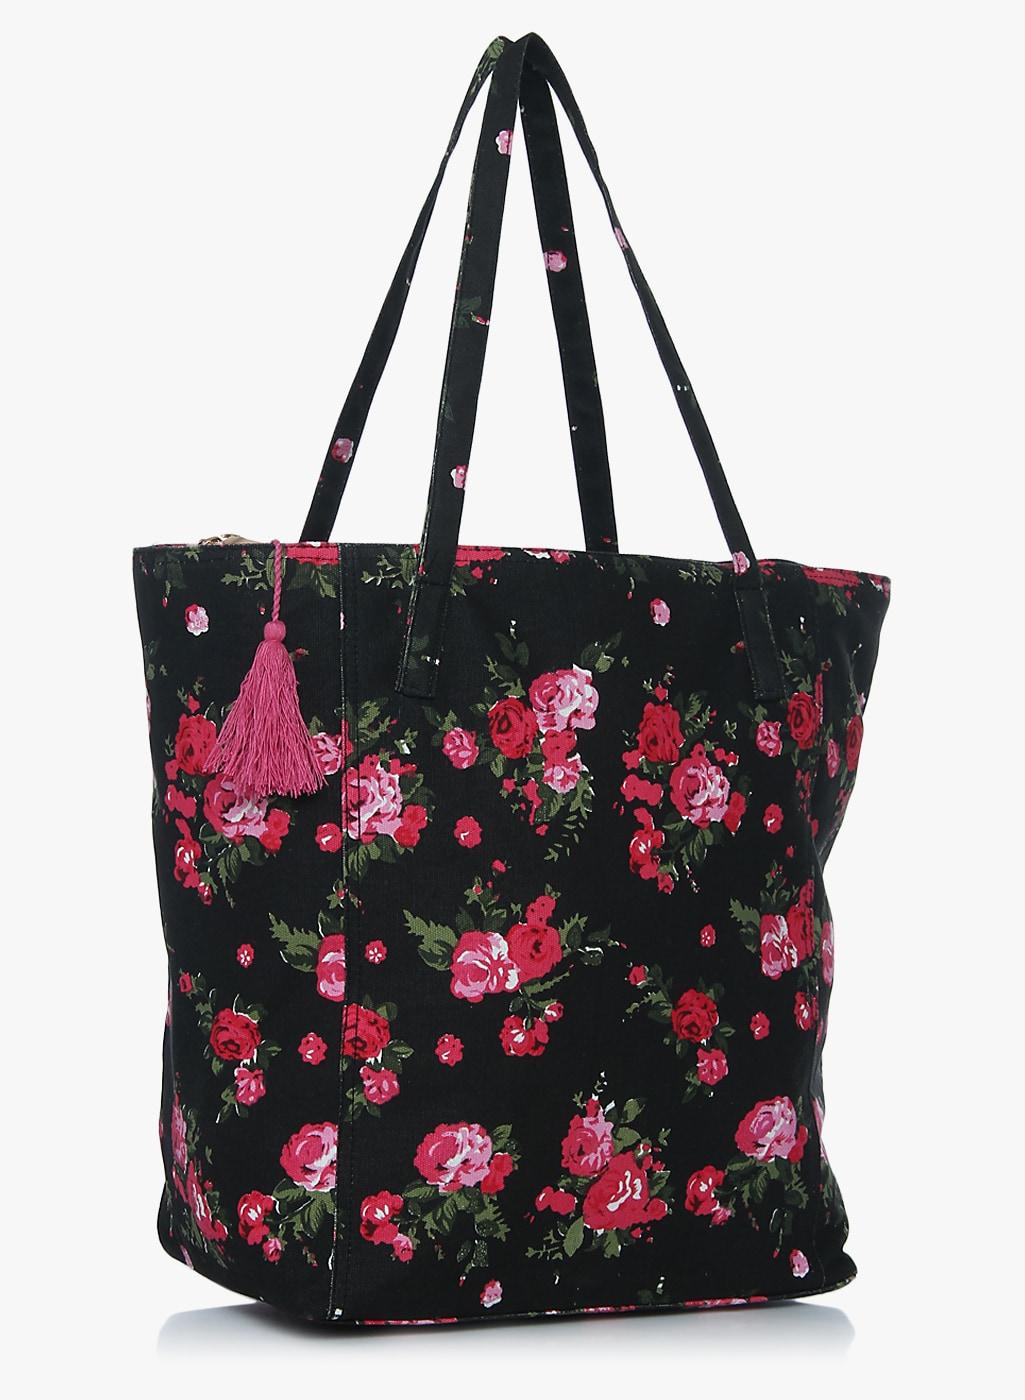 0f200b95f51 Black Handbags - Buy Black Handbags Online in India